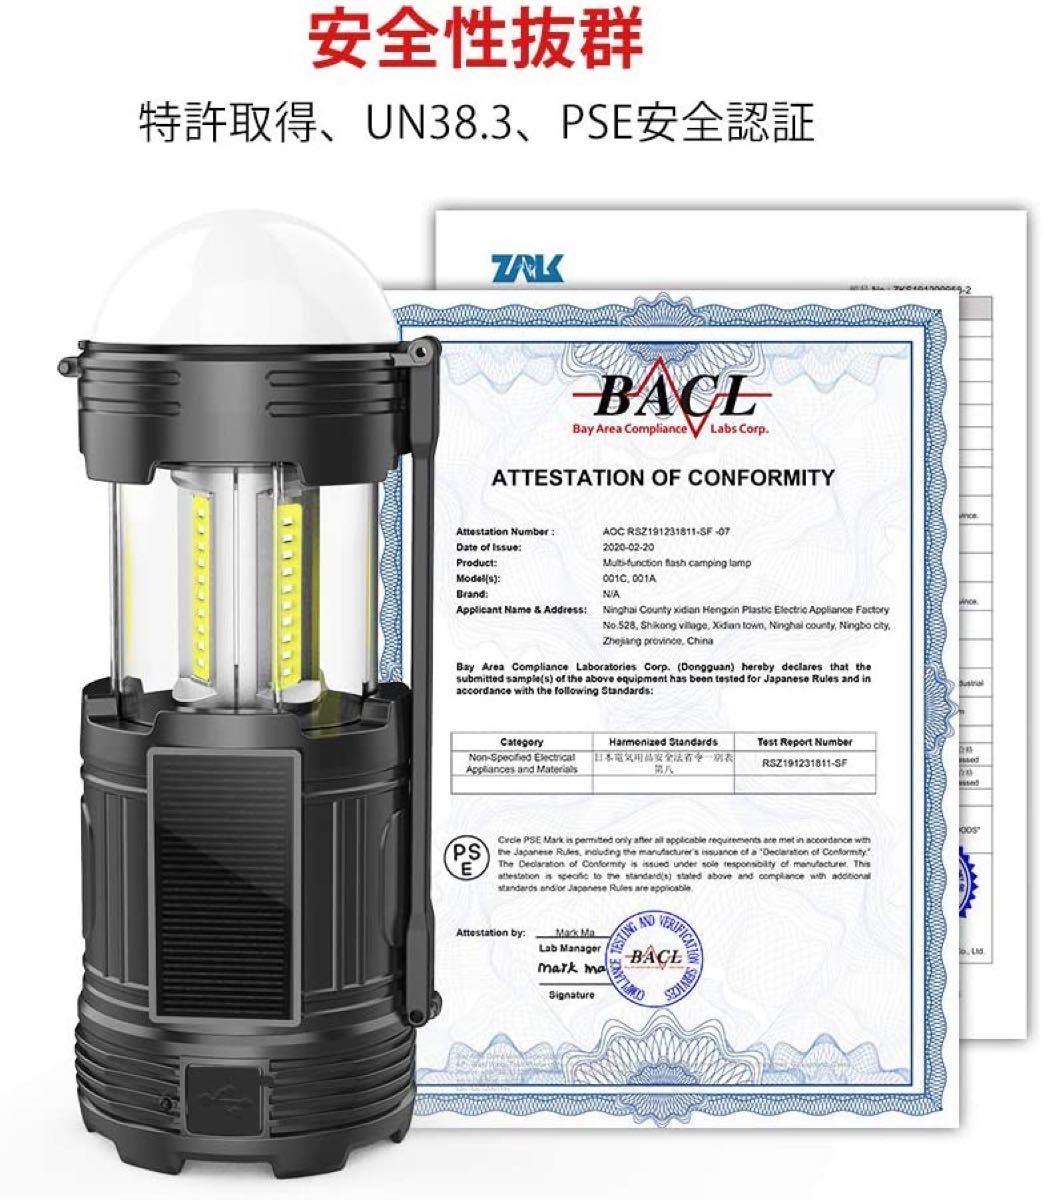 LEDランタン usb充電式 ソーラーランタン充電式 電池式 3 in 1給電